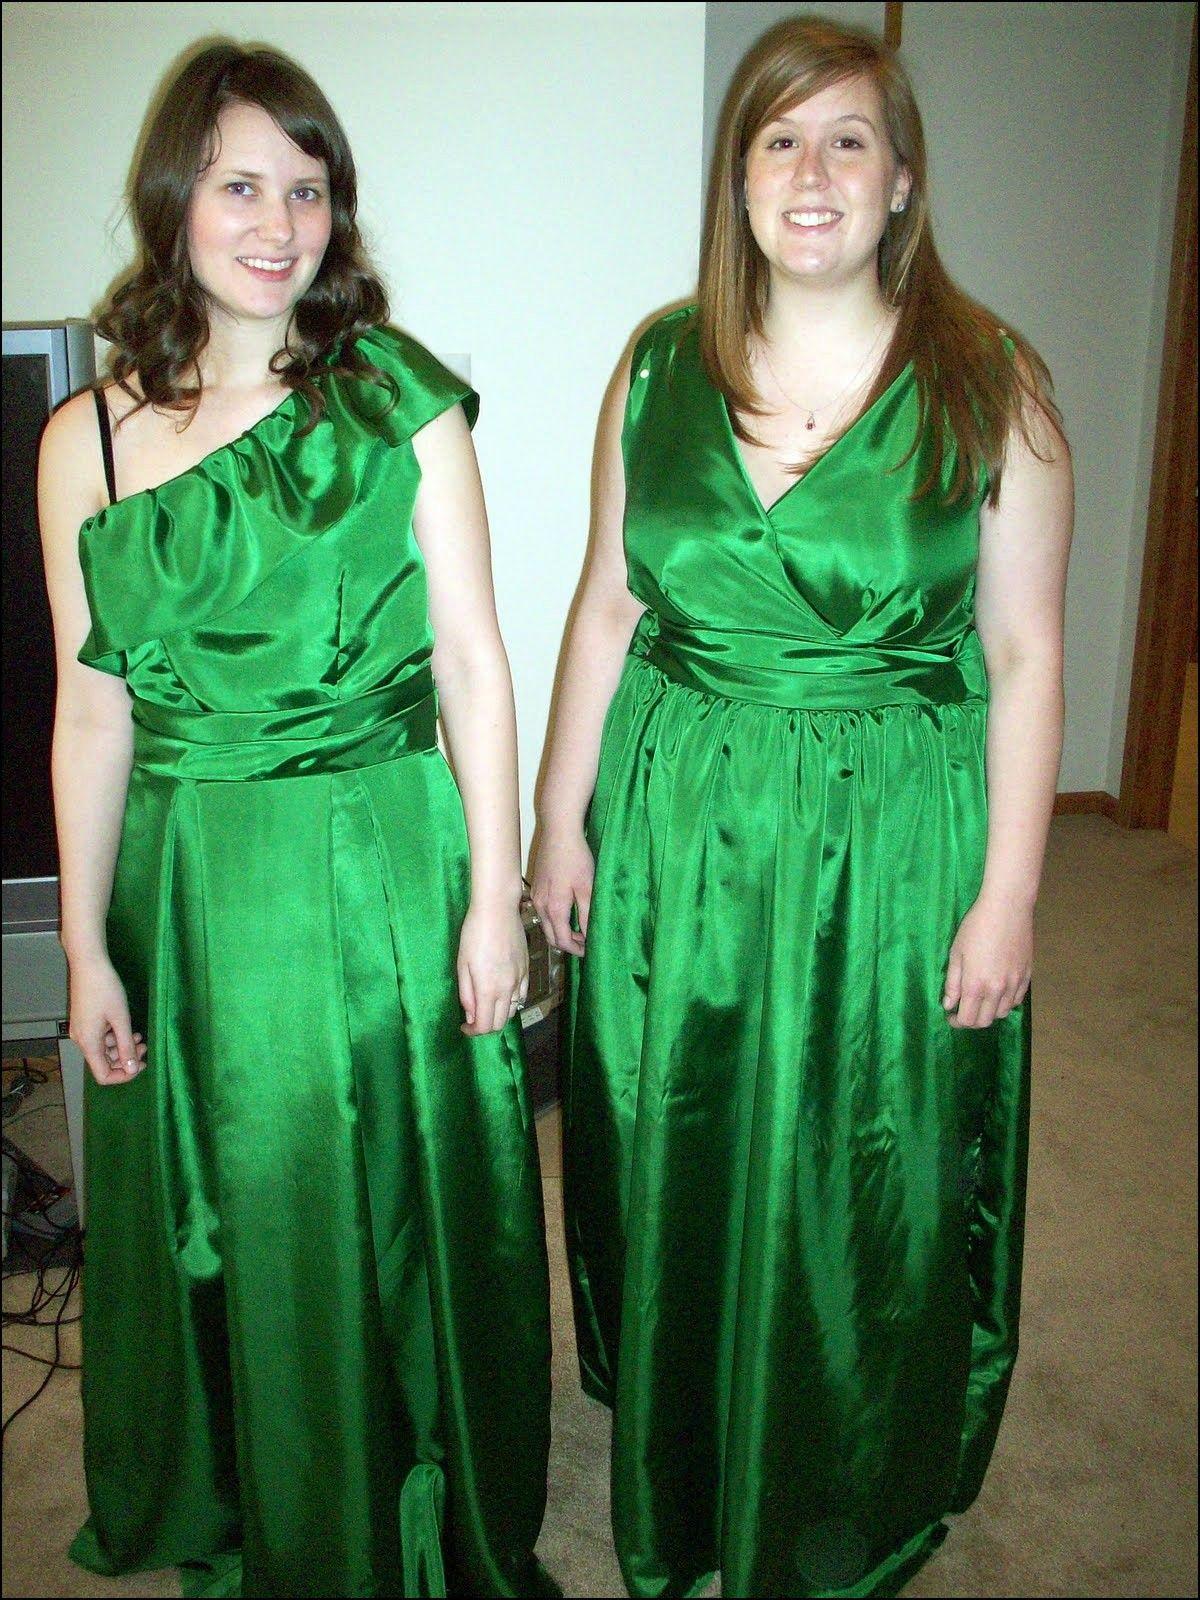 Worst bridesmaid dresses wedding gallery gallery worst bridesmaid dresses and gowns ideas ombrellifo Images